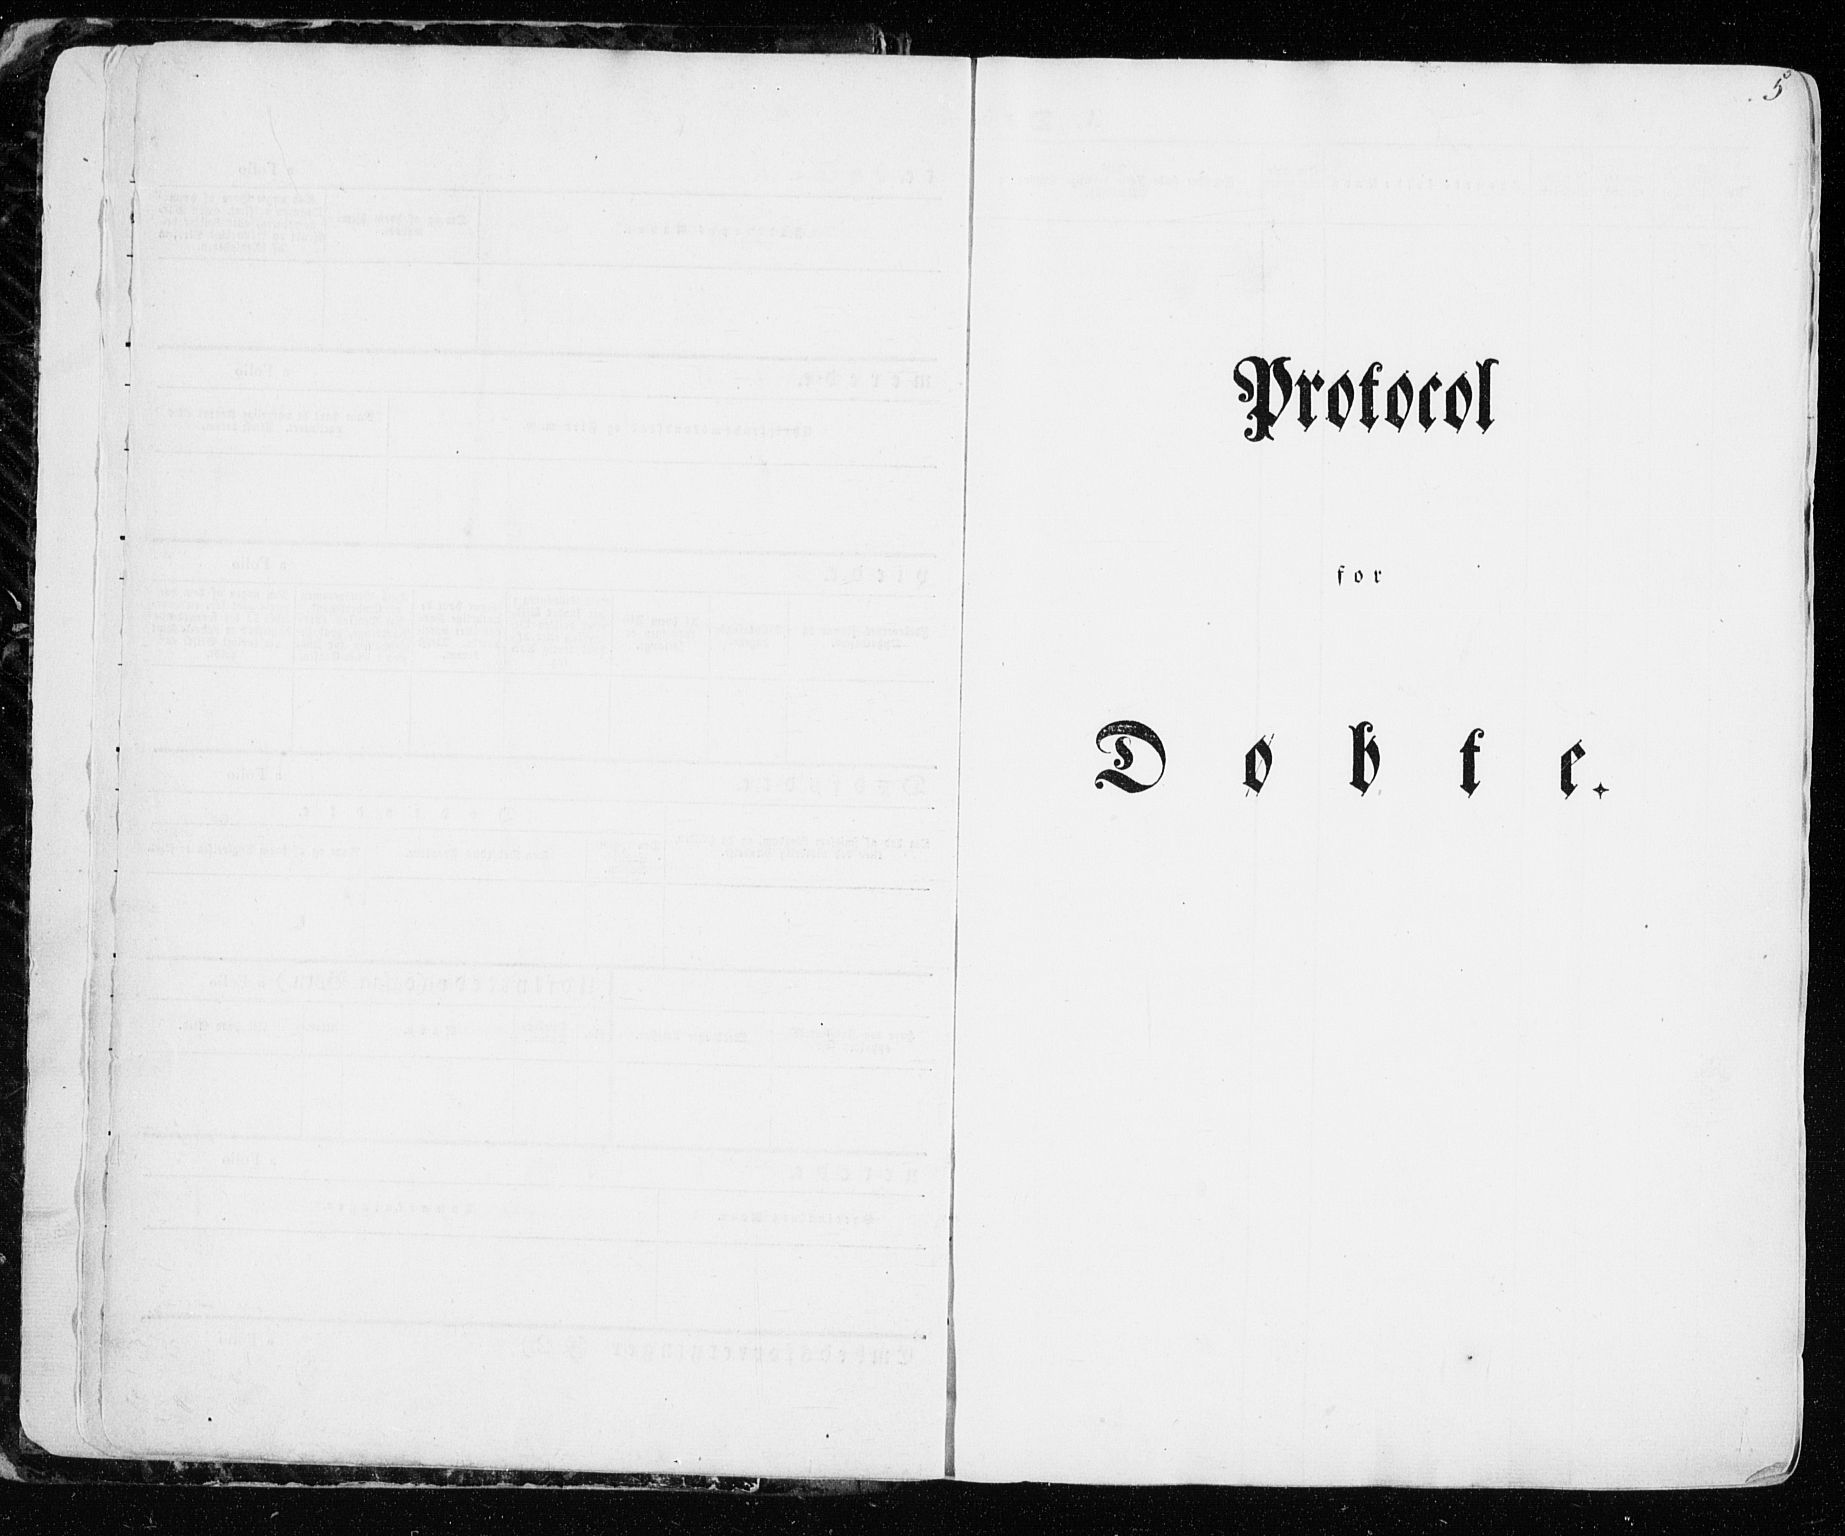 SATØ, Skjervøy sokneprestkontor, H/Ha/Haa/L0006kirke: Ministerialbok nr. 6, 1848-1859, s. 5